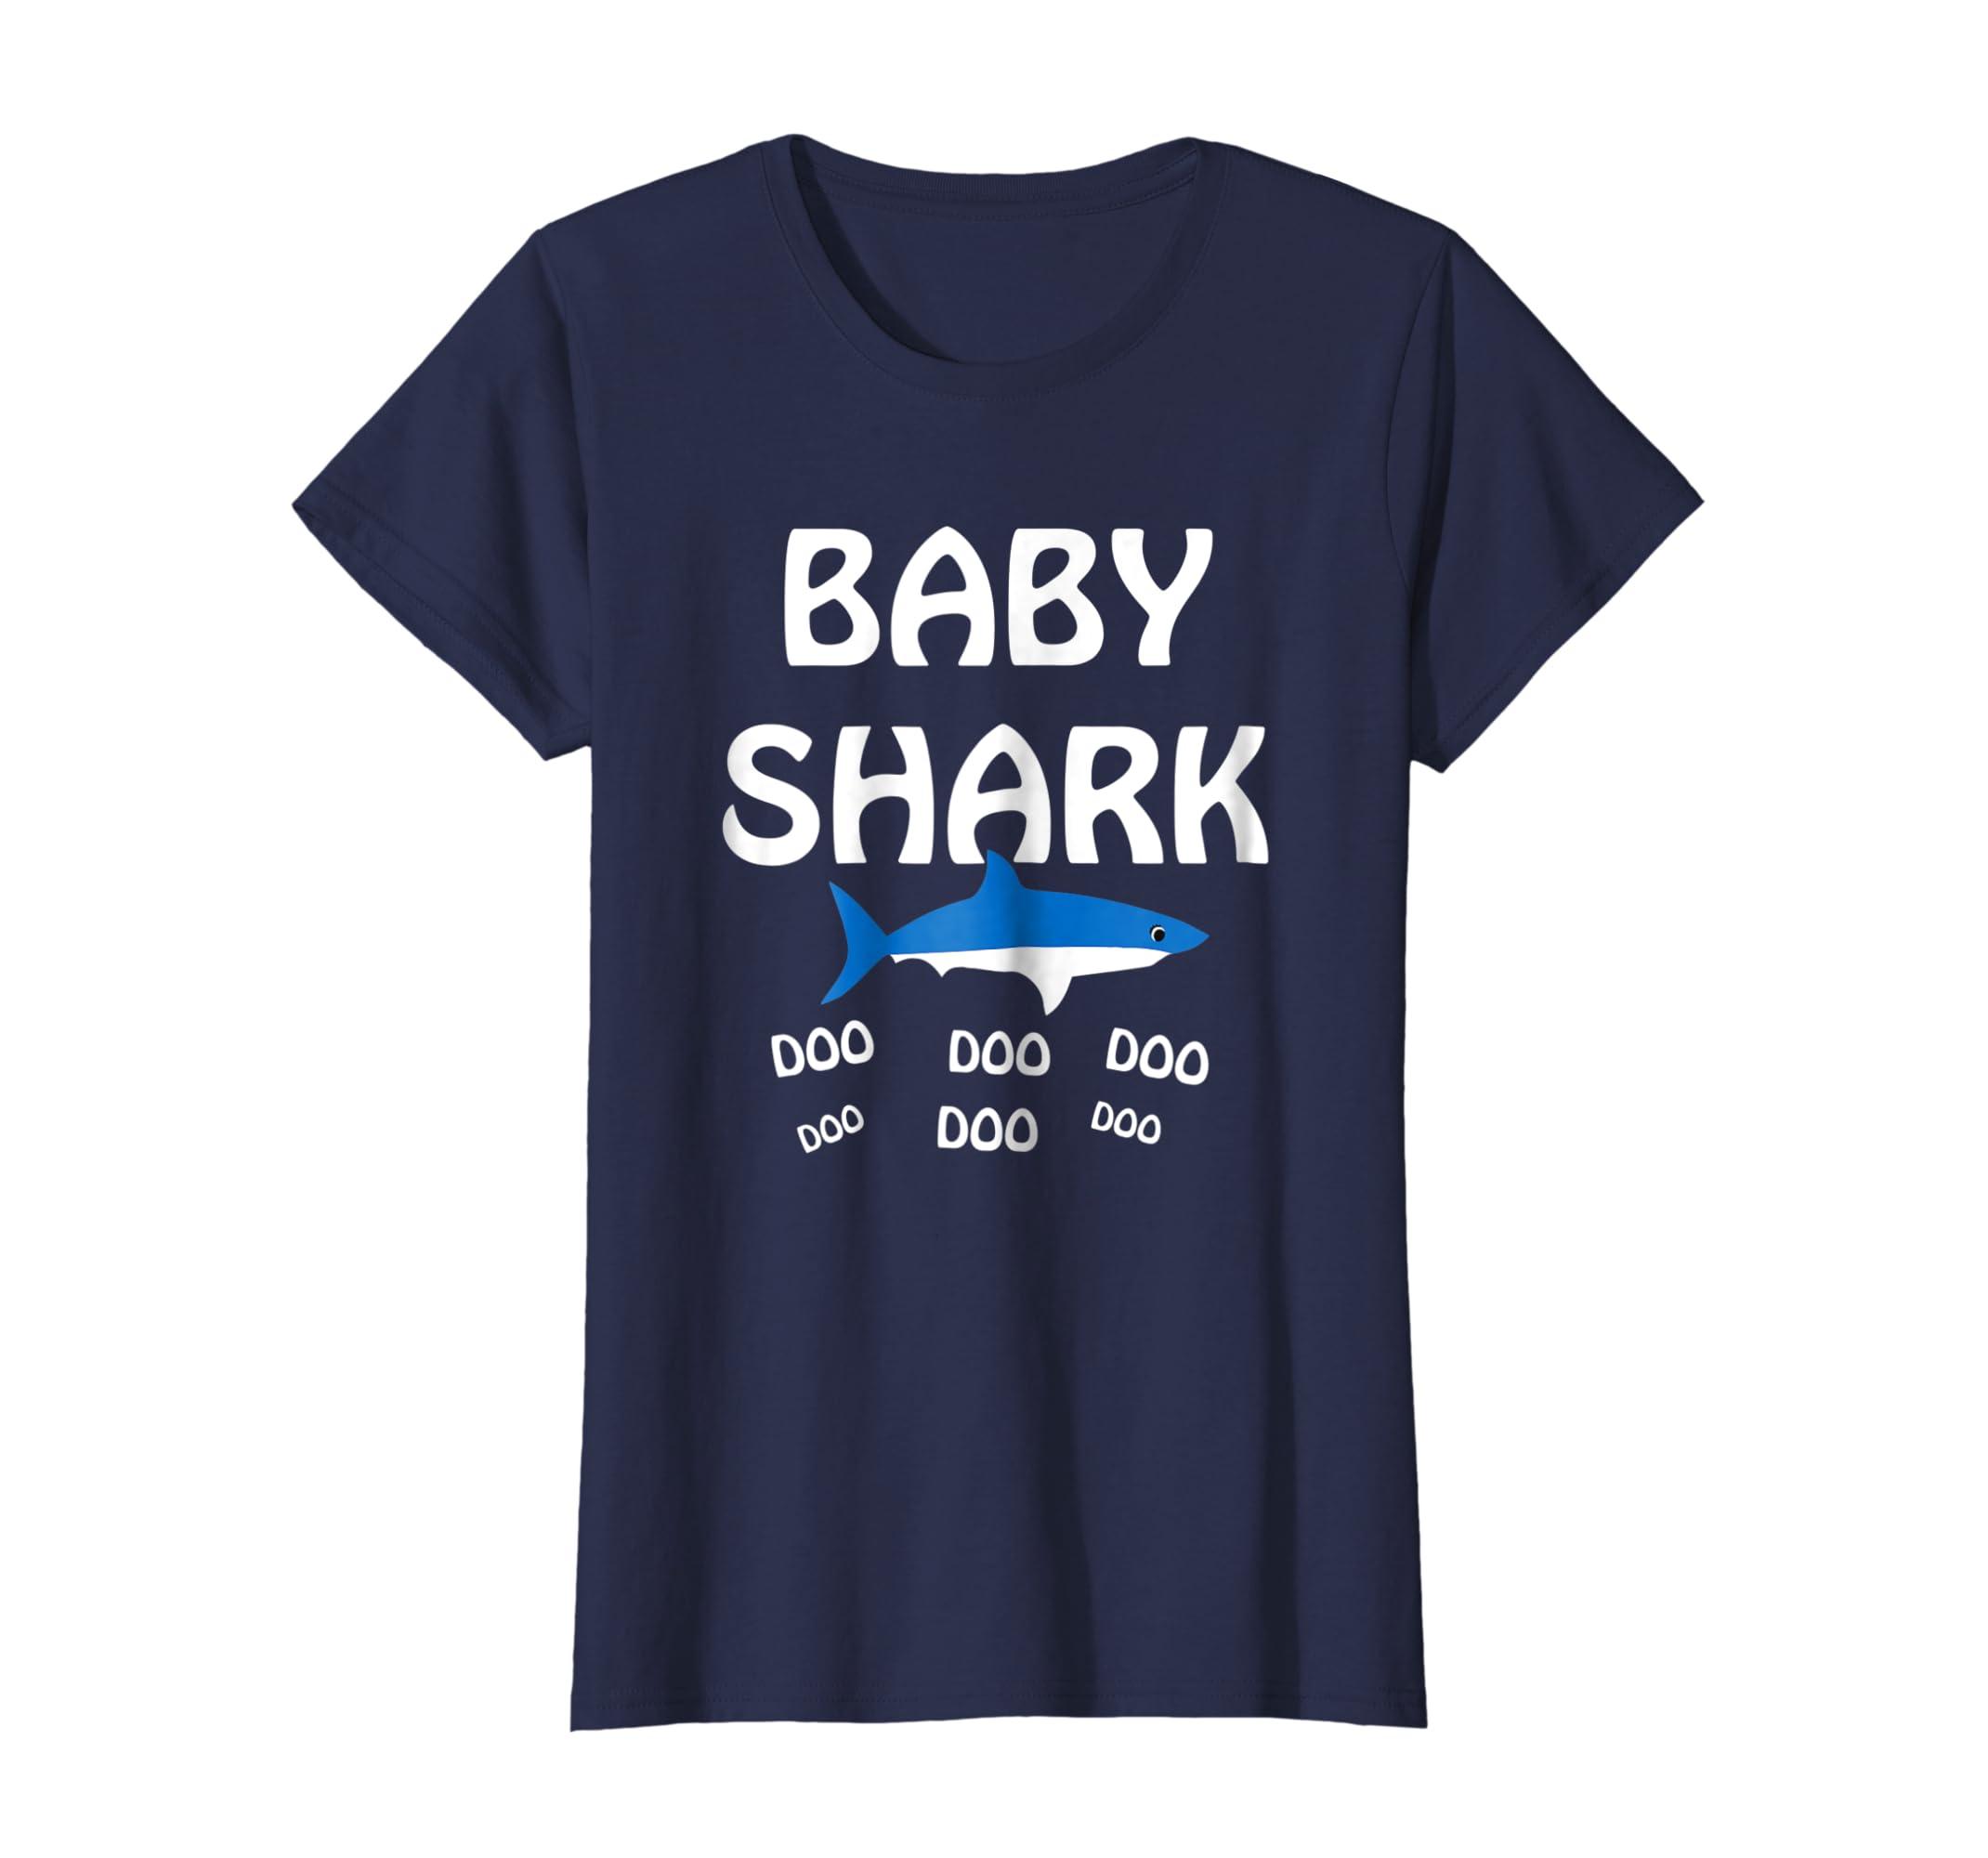 fd1f17462 Amazon.com: Kids Baby Shark Doo Doo Doo T-shirt - Matching Family Shirt:  Clothing